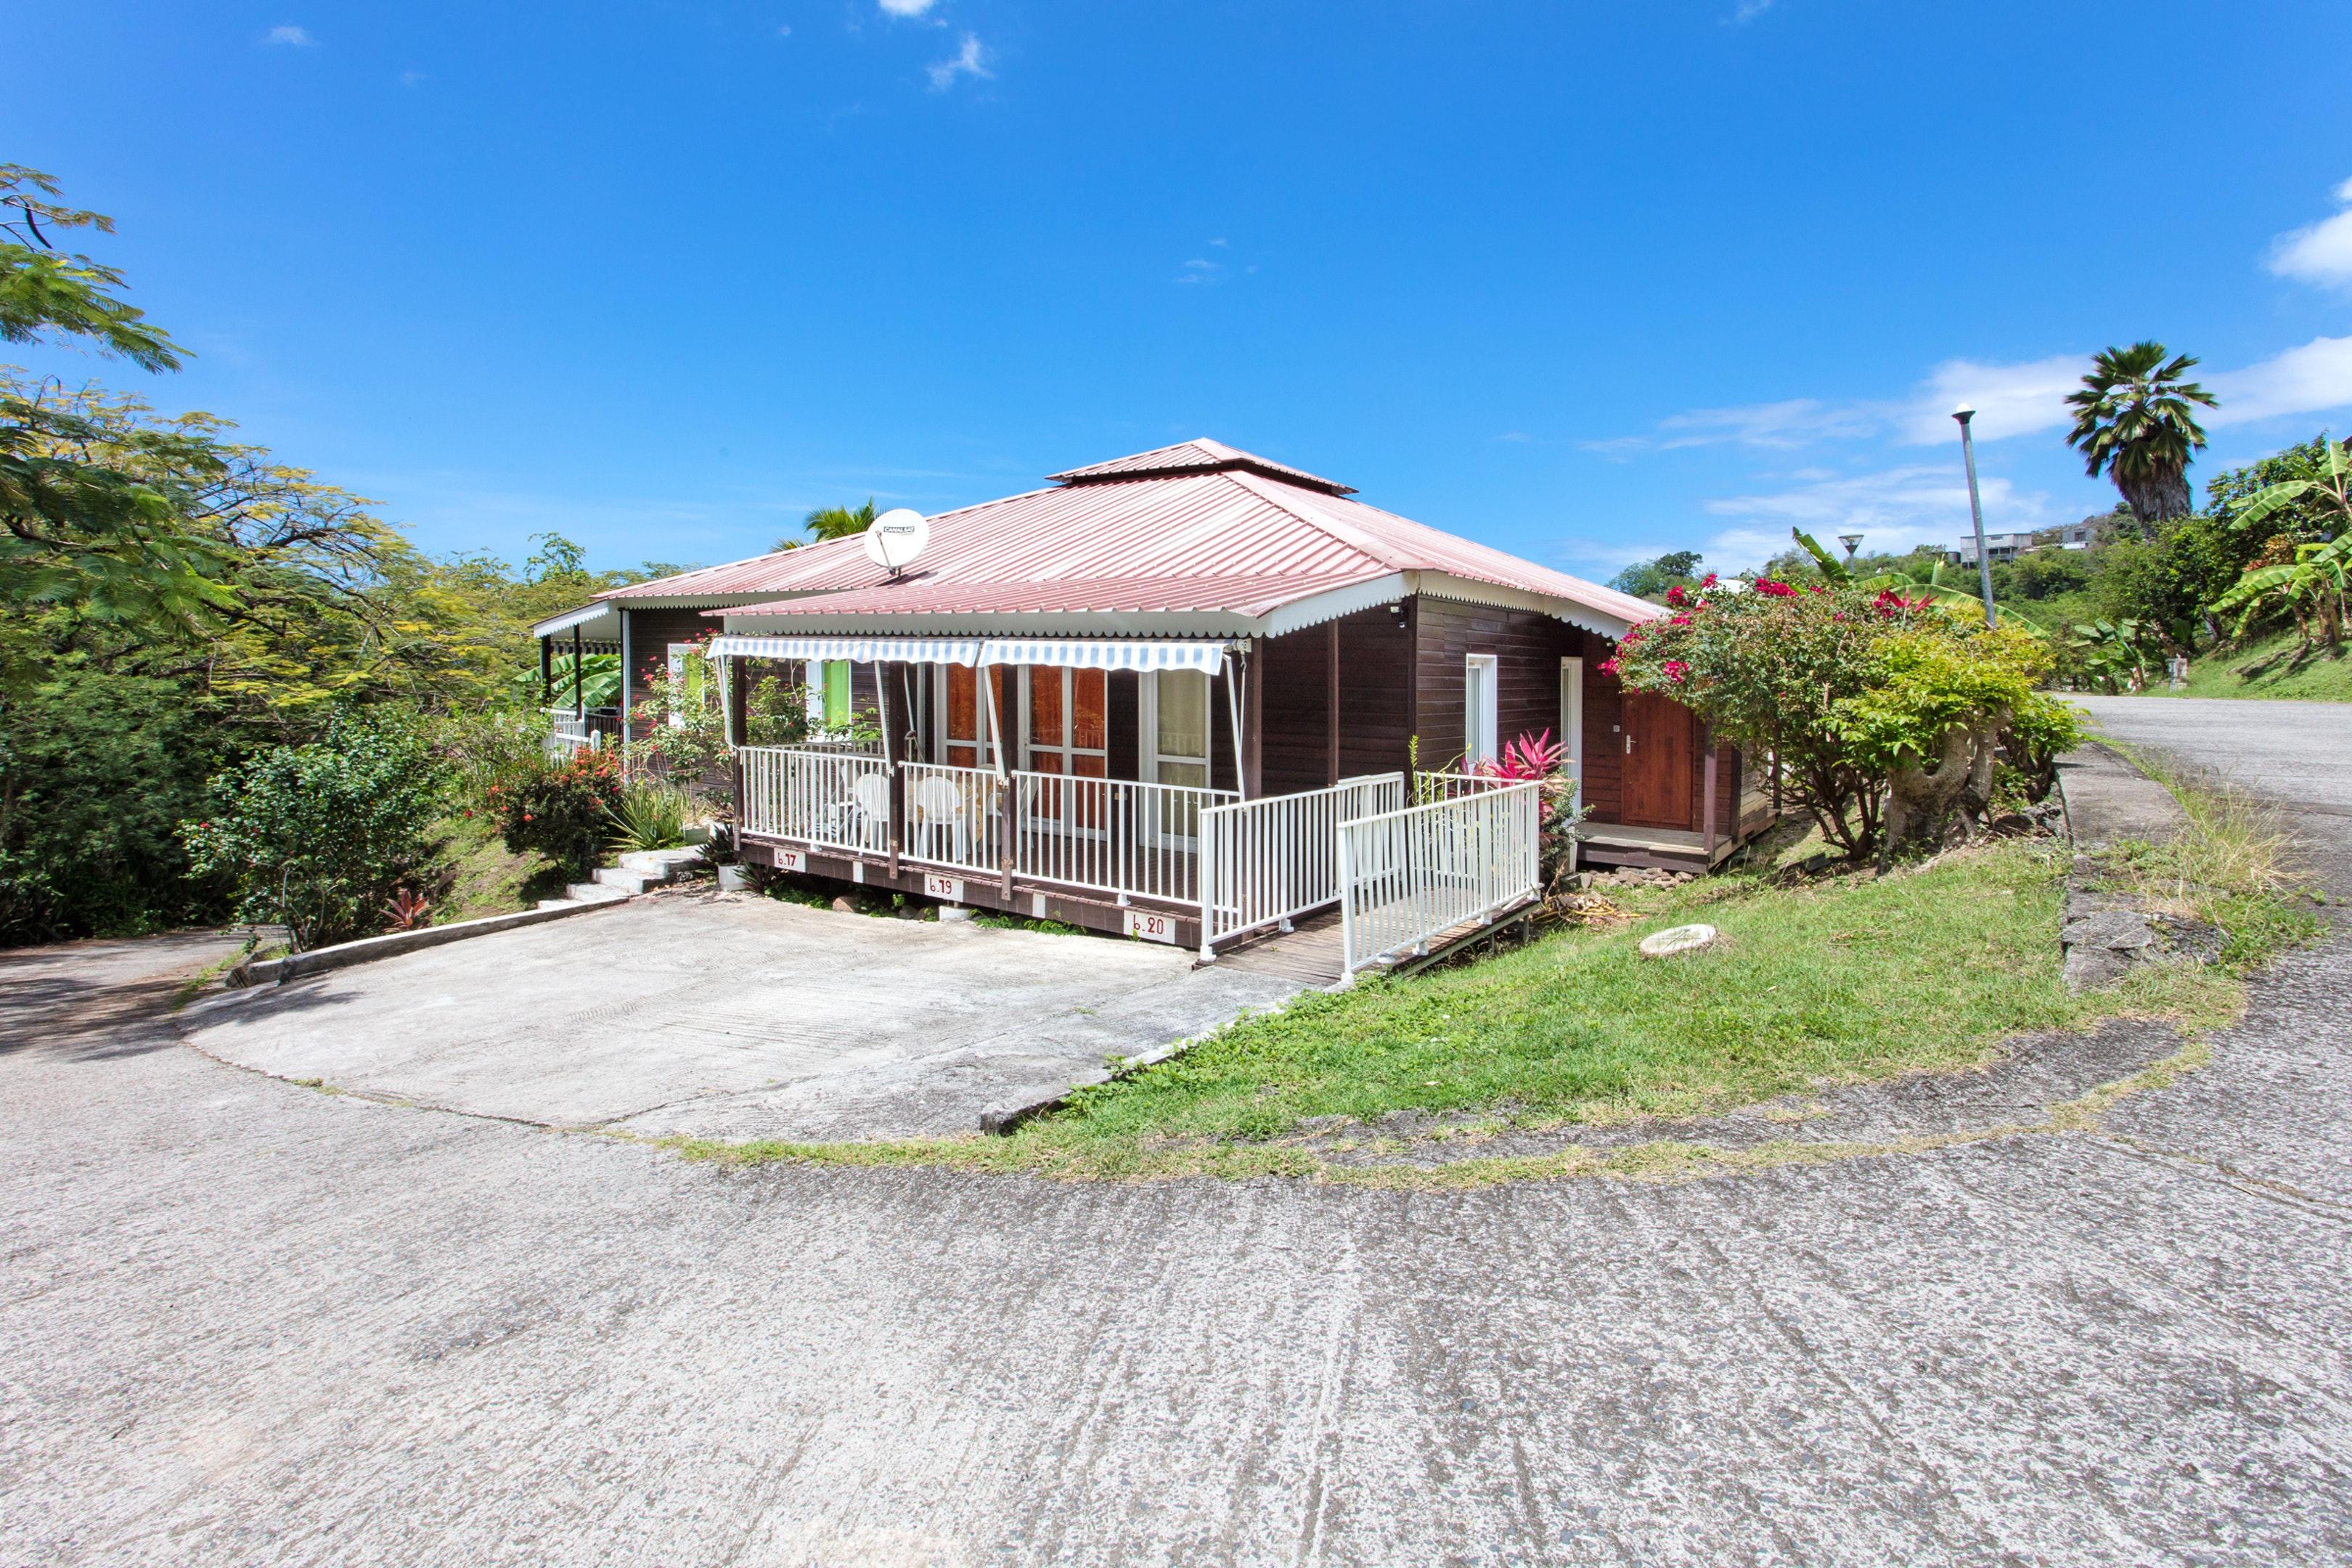 Bungalow mit 2 Schlafzimmern in Bouillante mit m&o Hütte in Guadeloupe